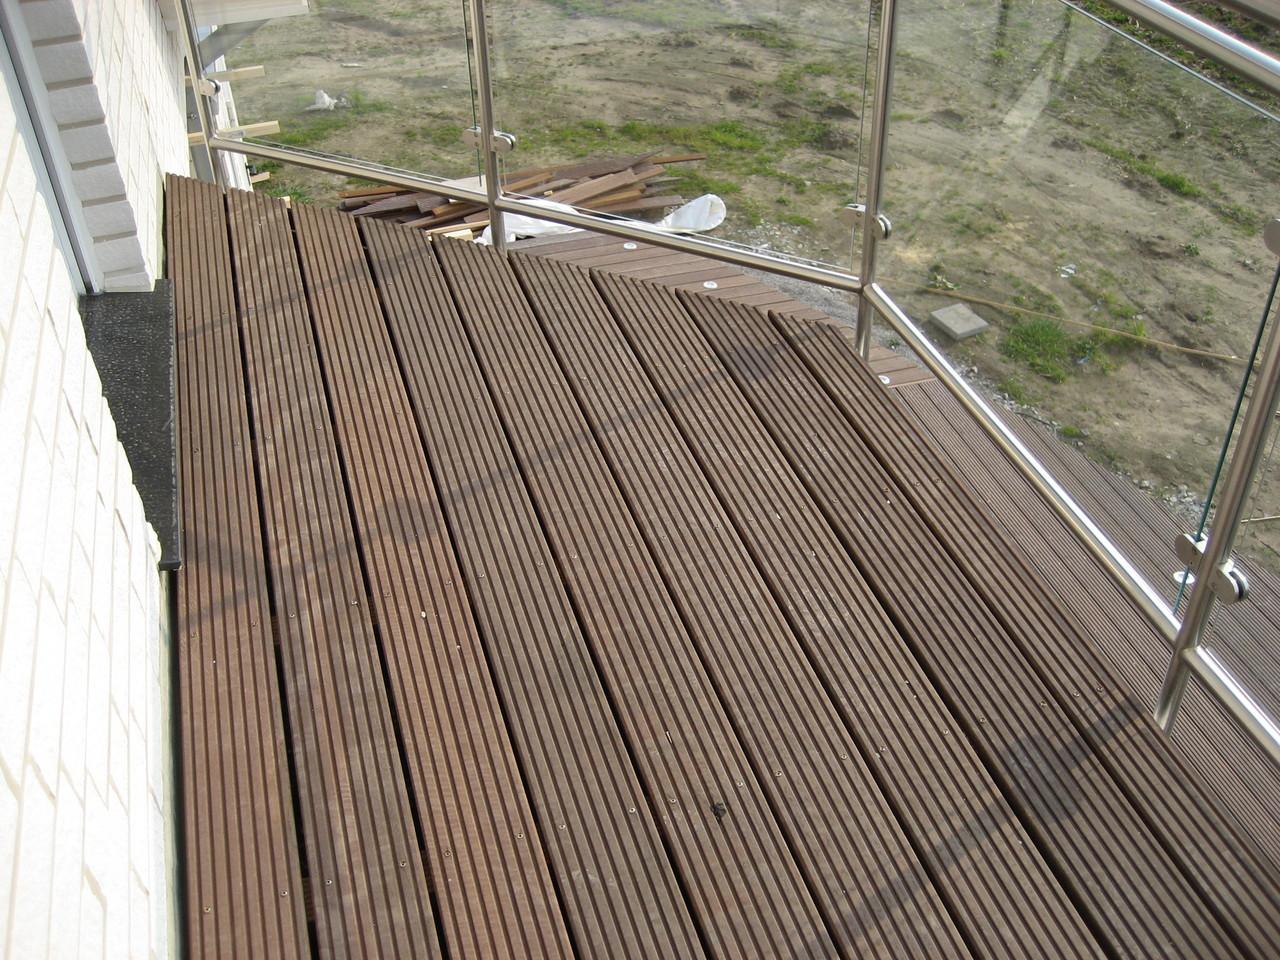 Balkon mit Massaranduba - Dielen